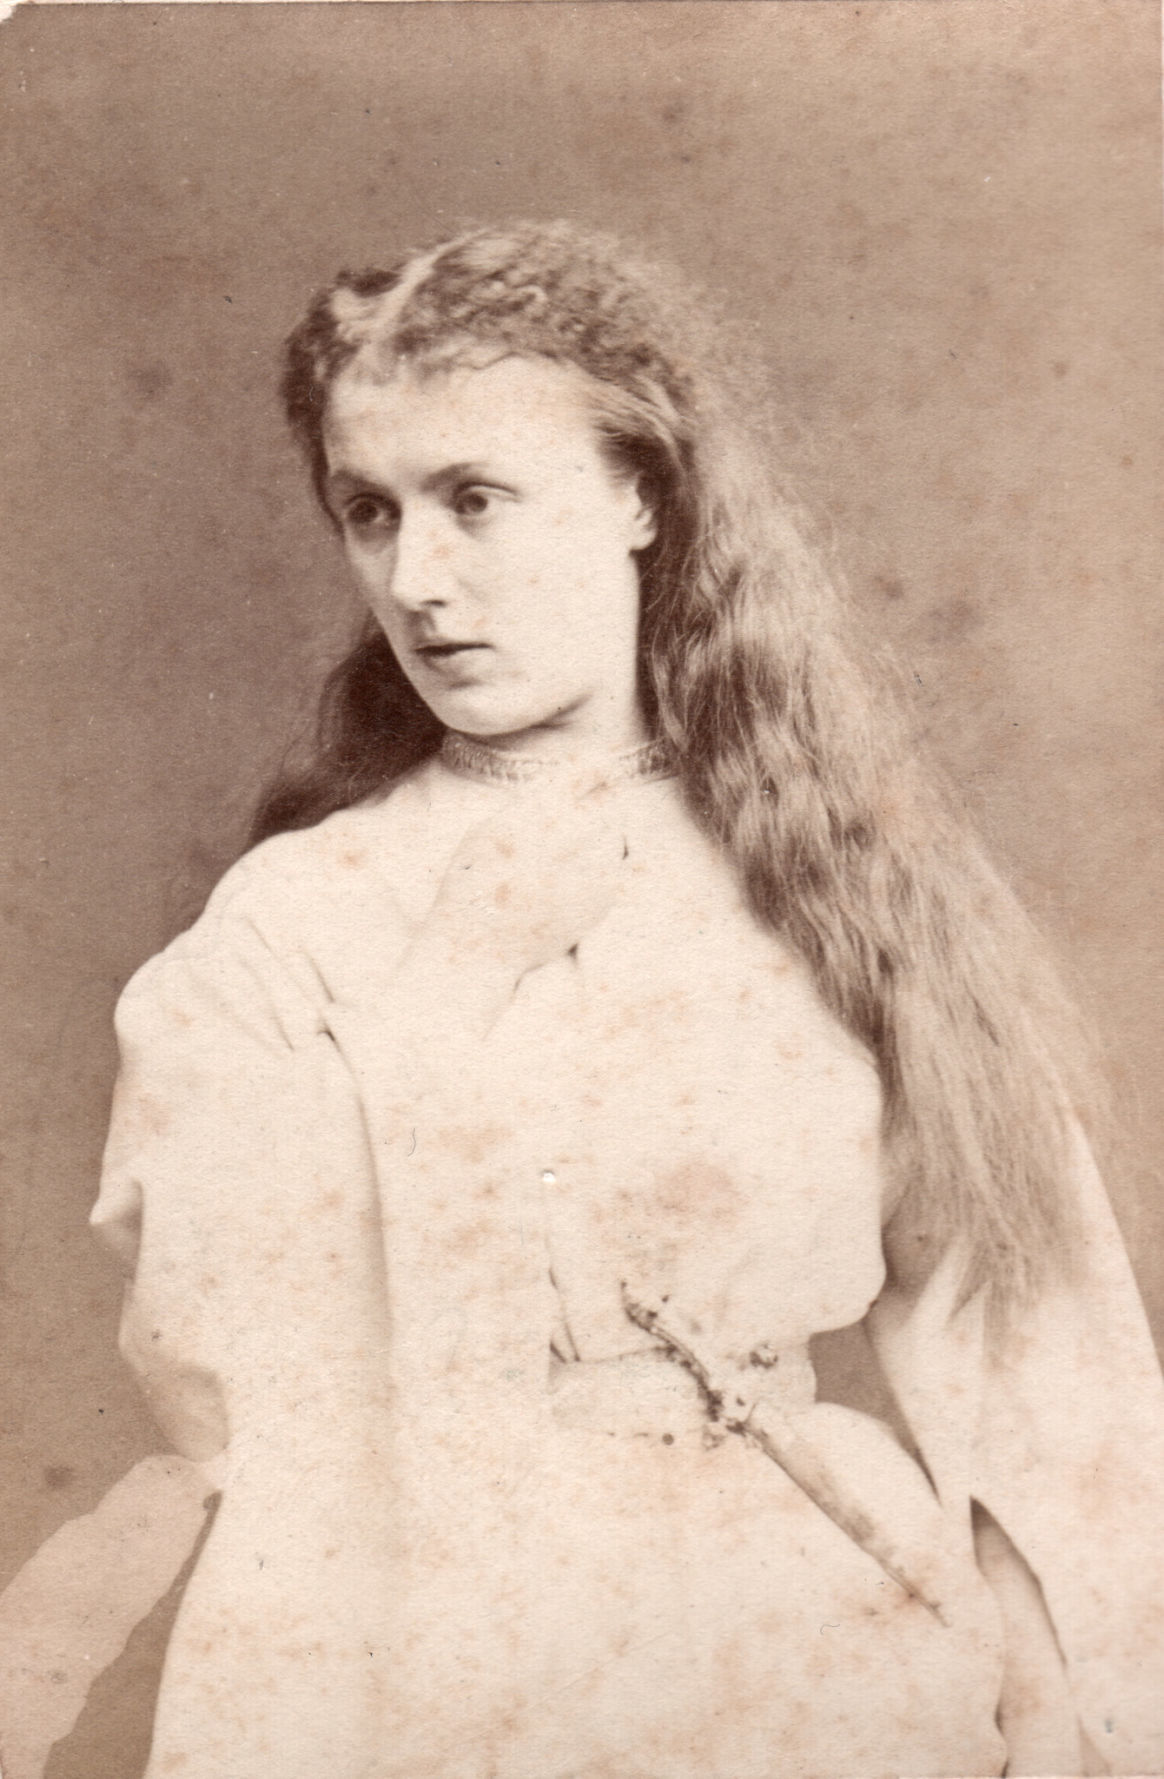 Millicent Palmer